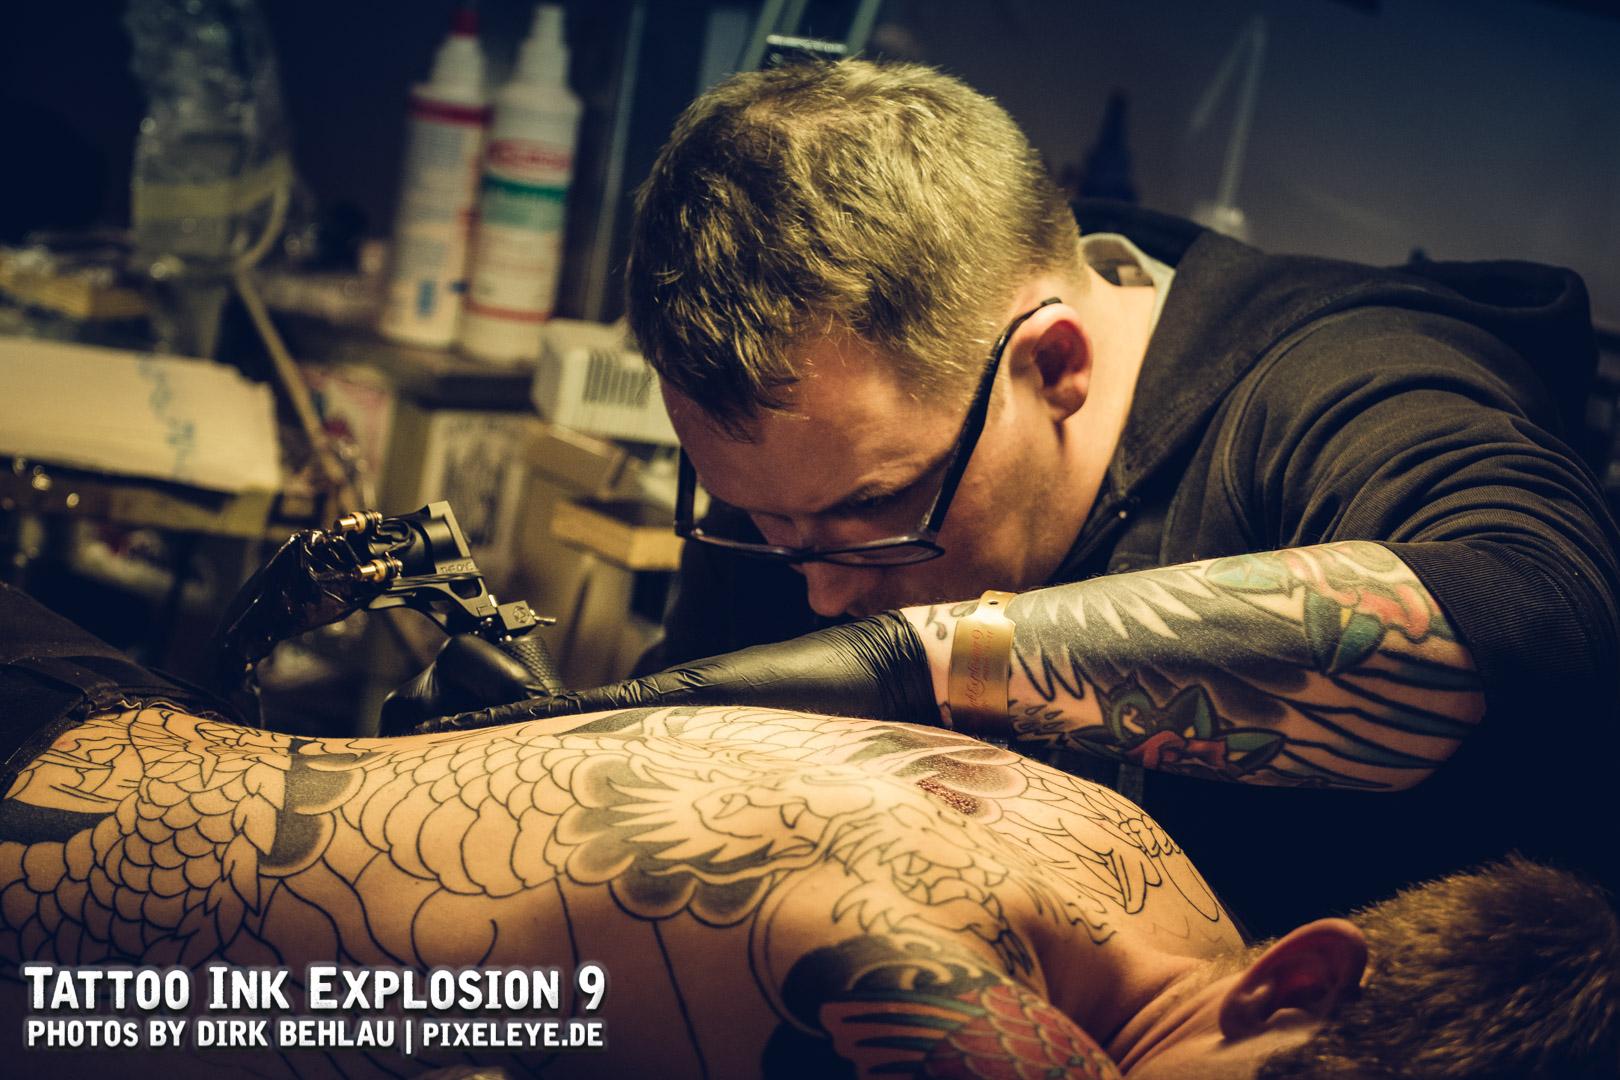 Tattoo Ink Explosion 2018 WEB by Dirk Behlau-1281.jpg